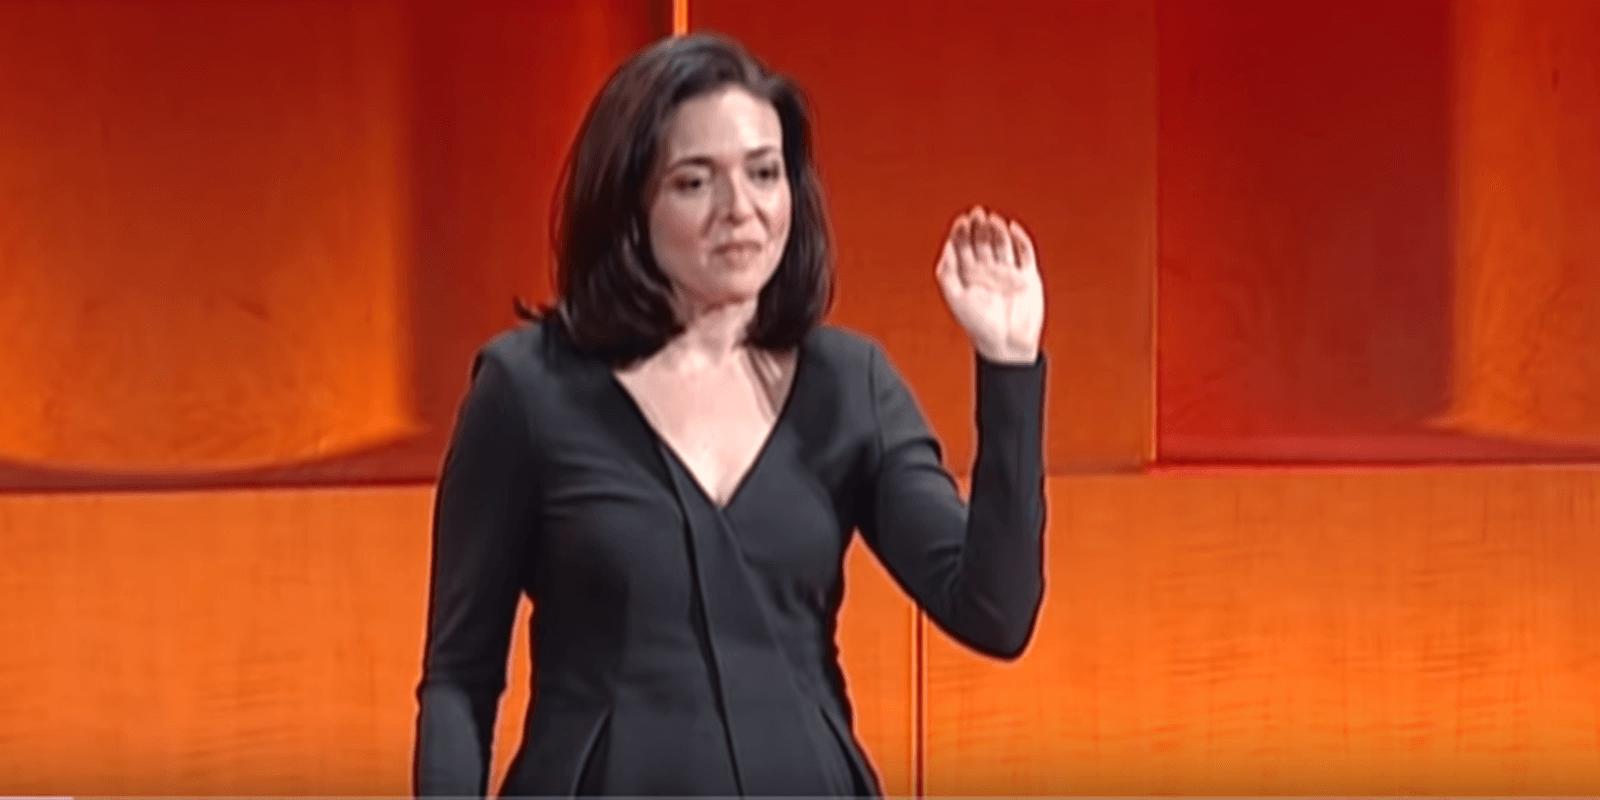 Sheryl Sandberg TED Talk Featured Image